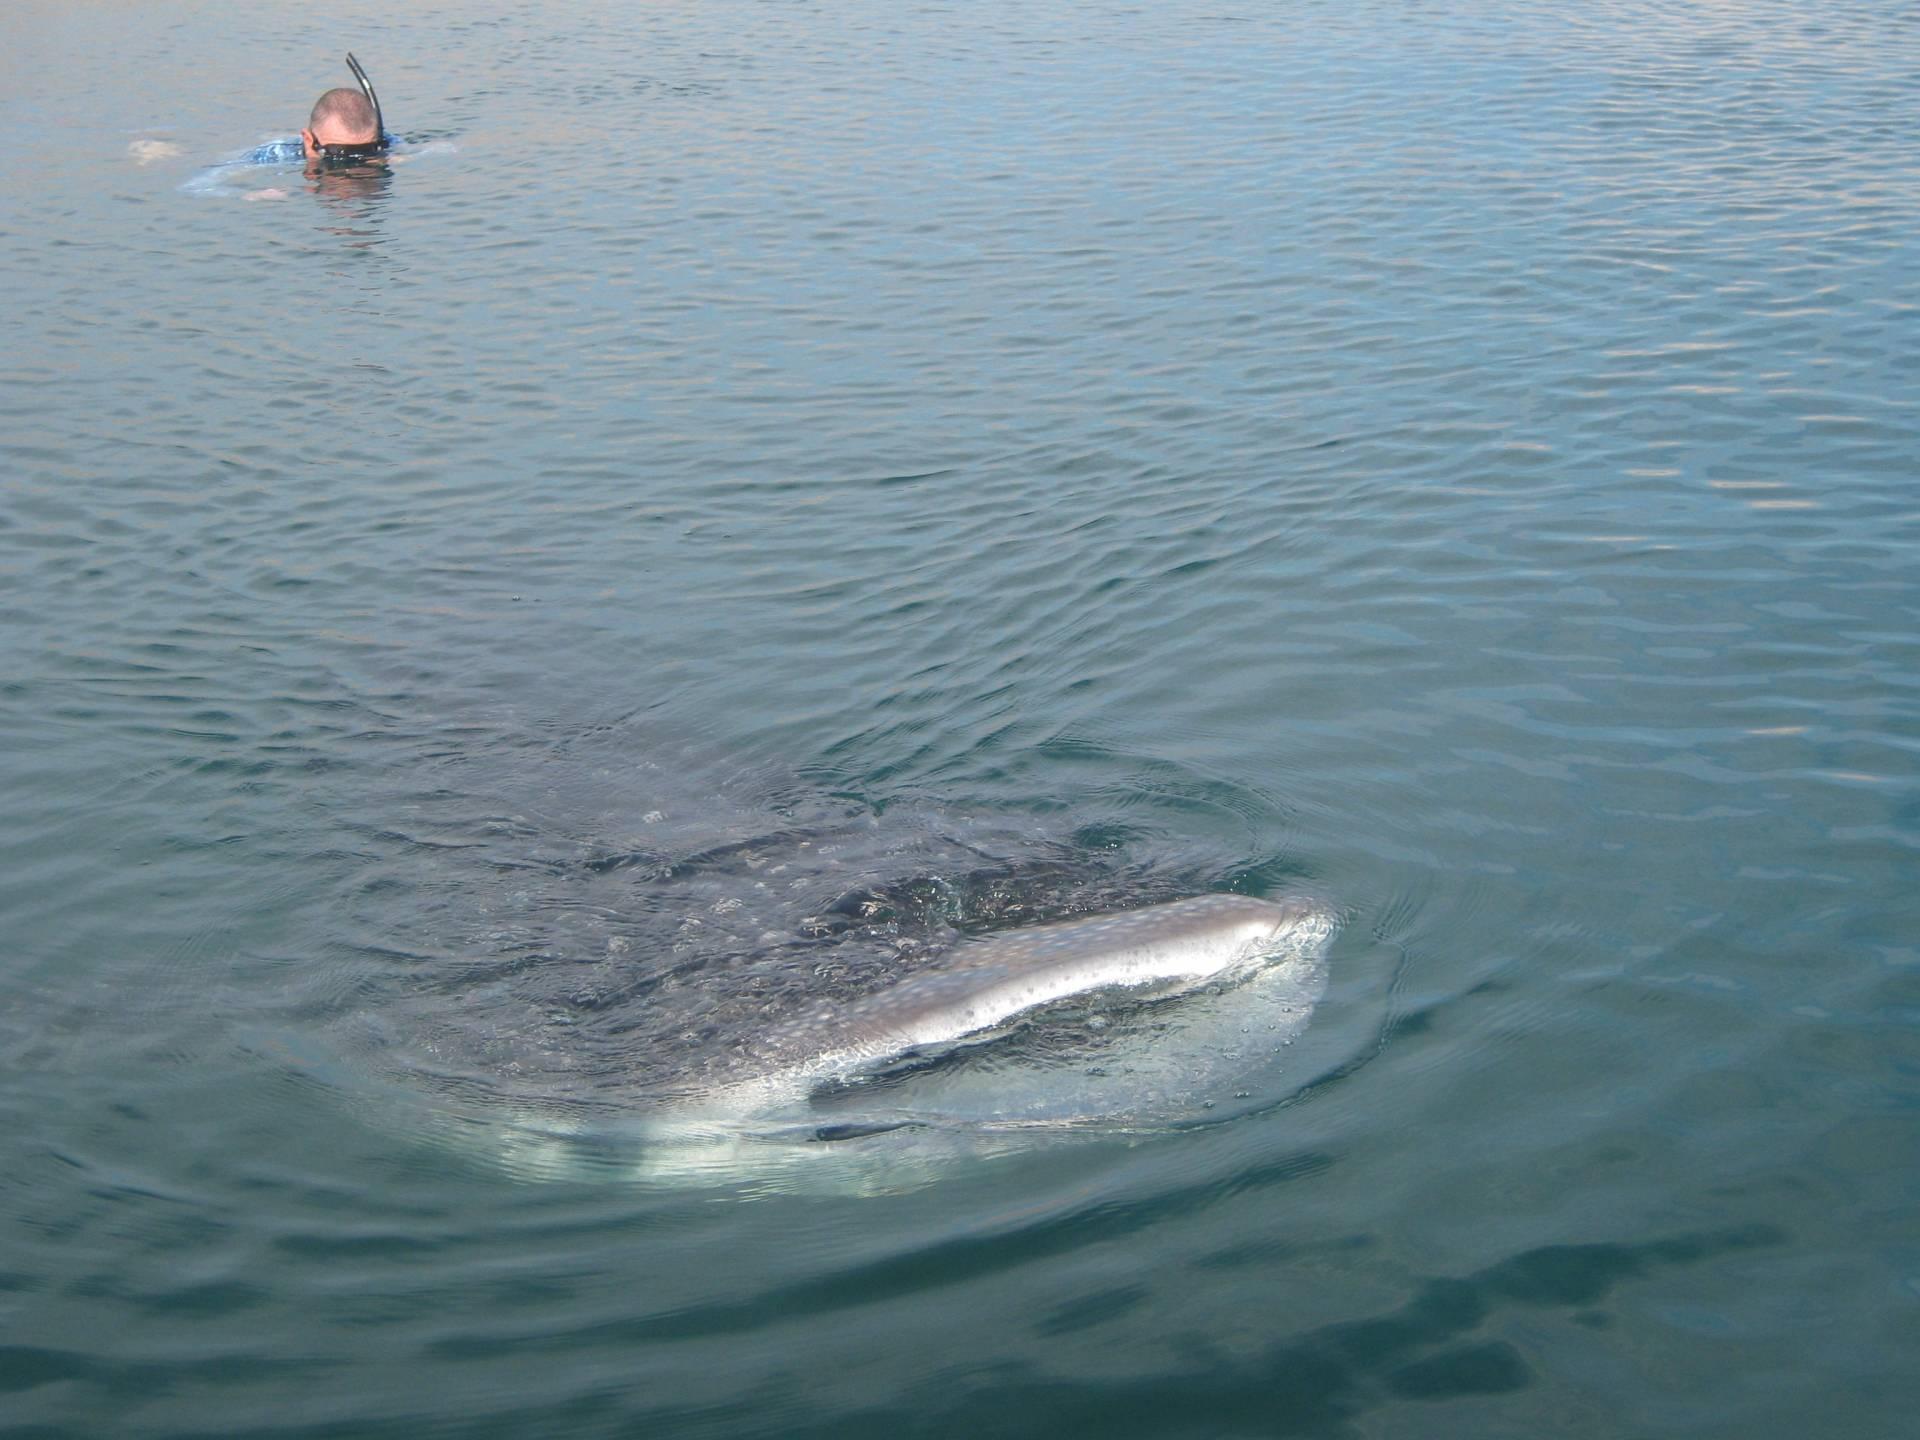 Bahia de los shark 7 sep sport for Fishing in los angeles